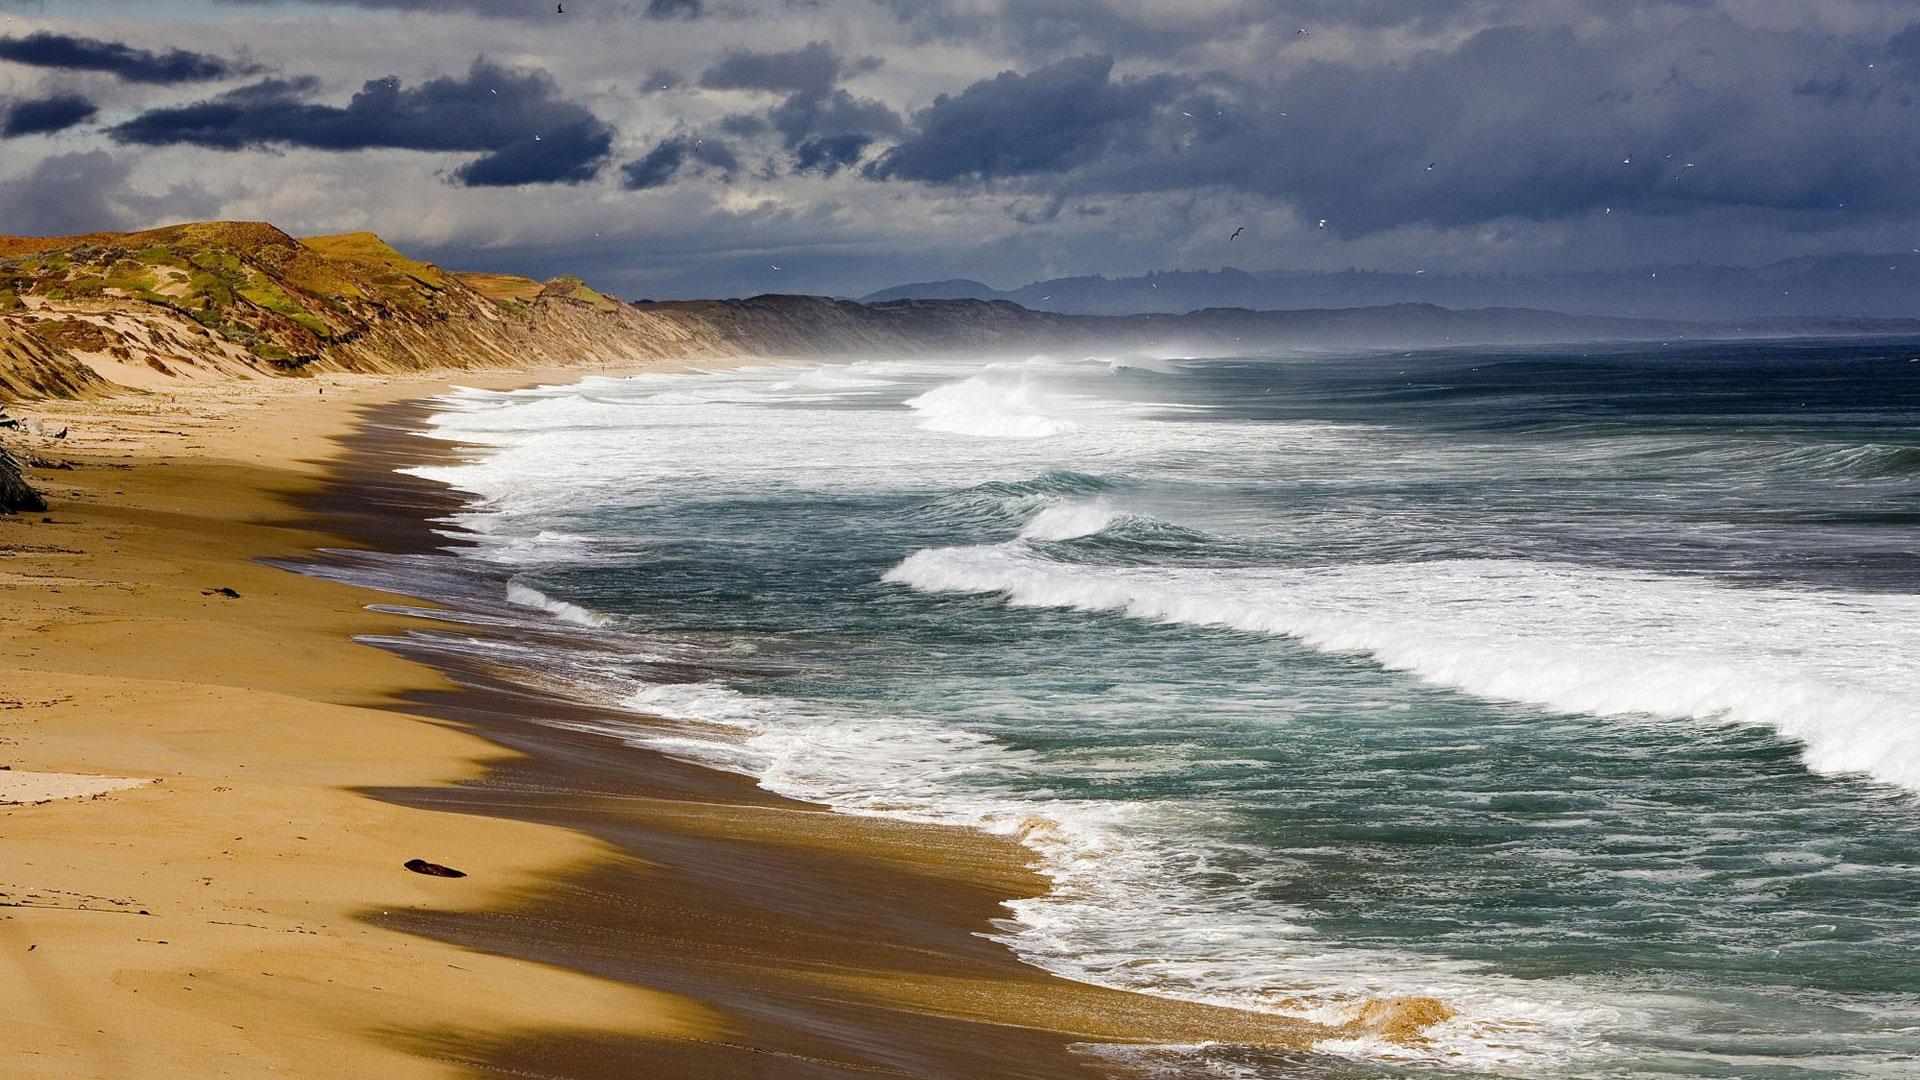 видео море и песок